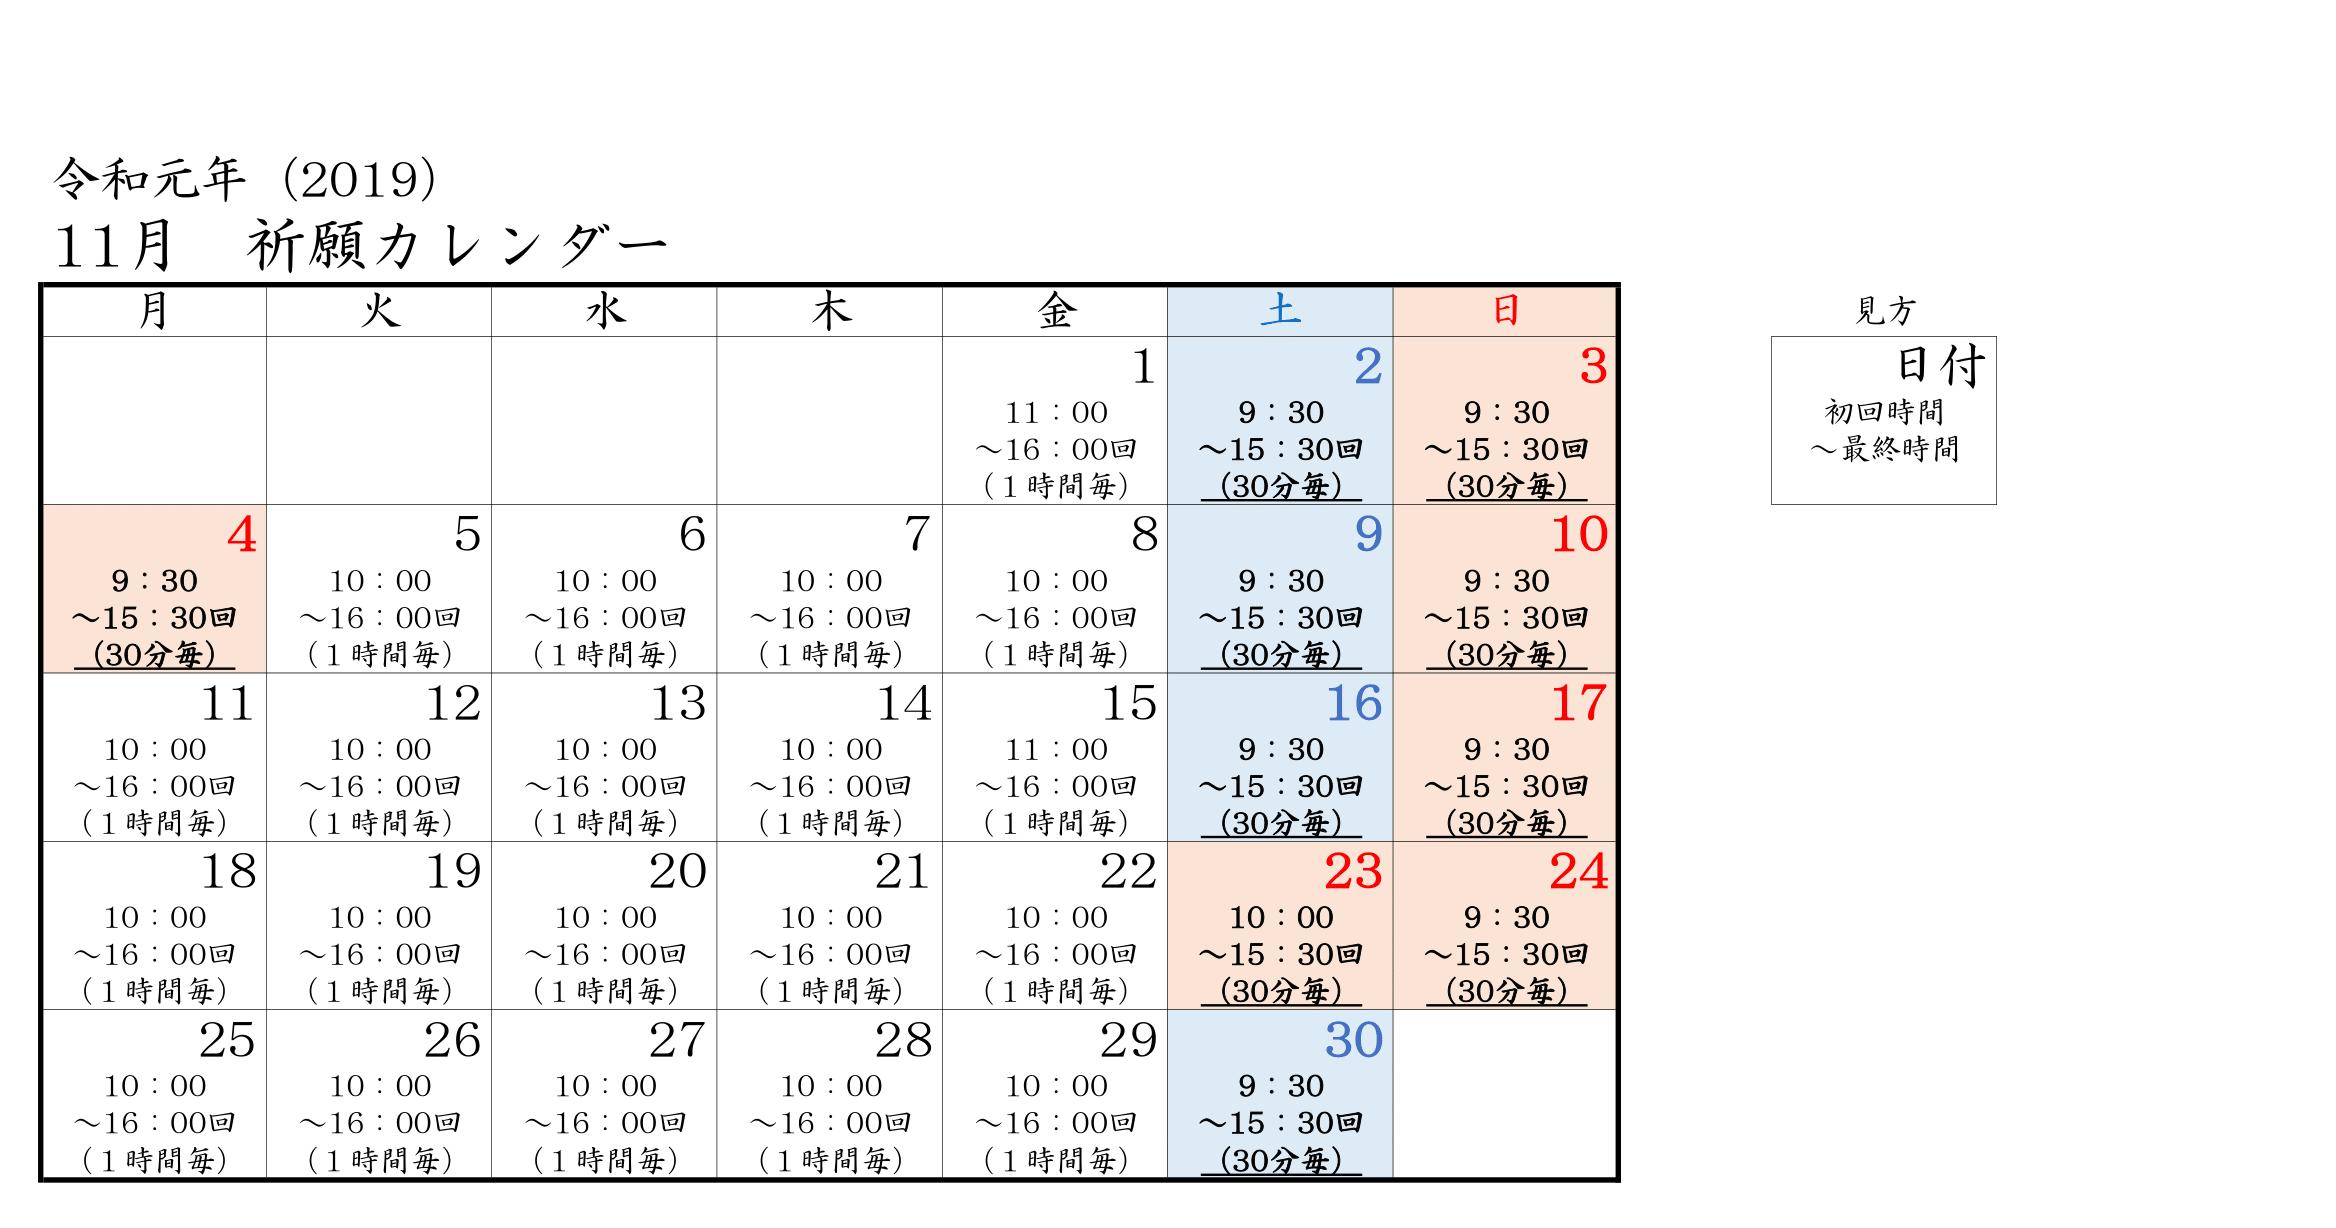 R1.11 七五三 予約カレンダー-1.png